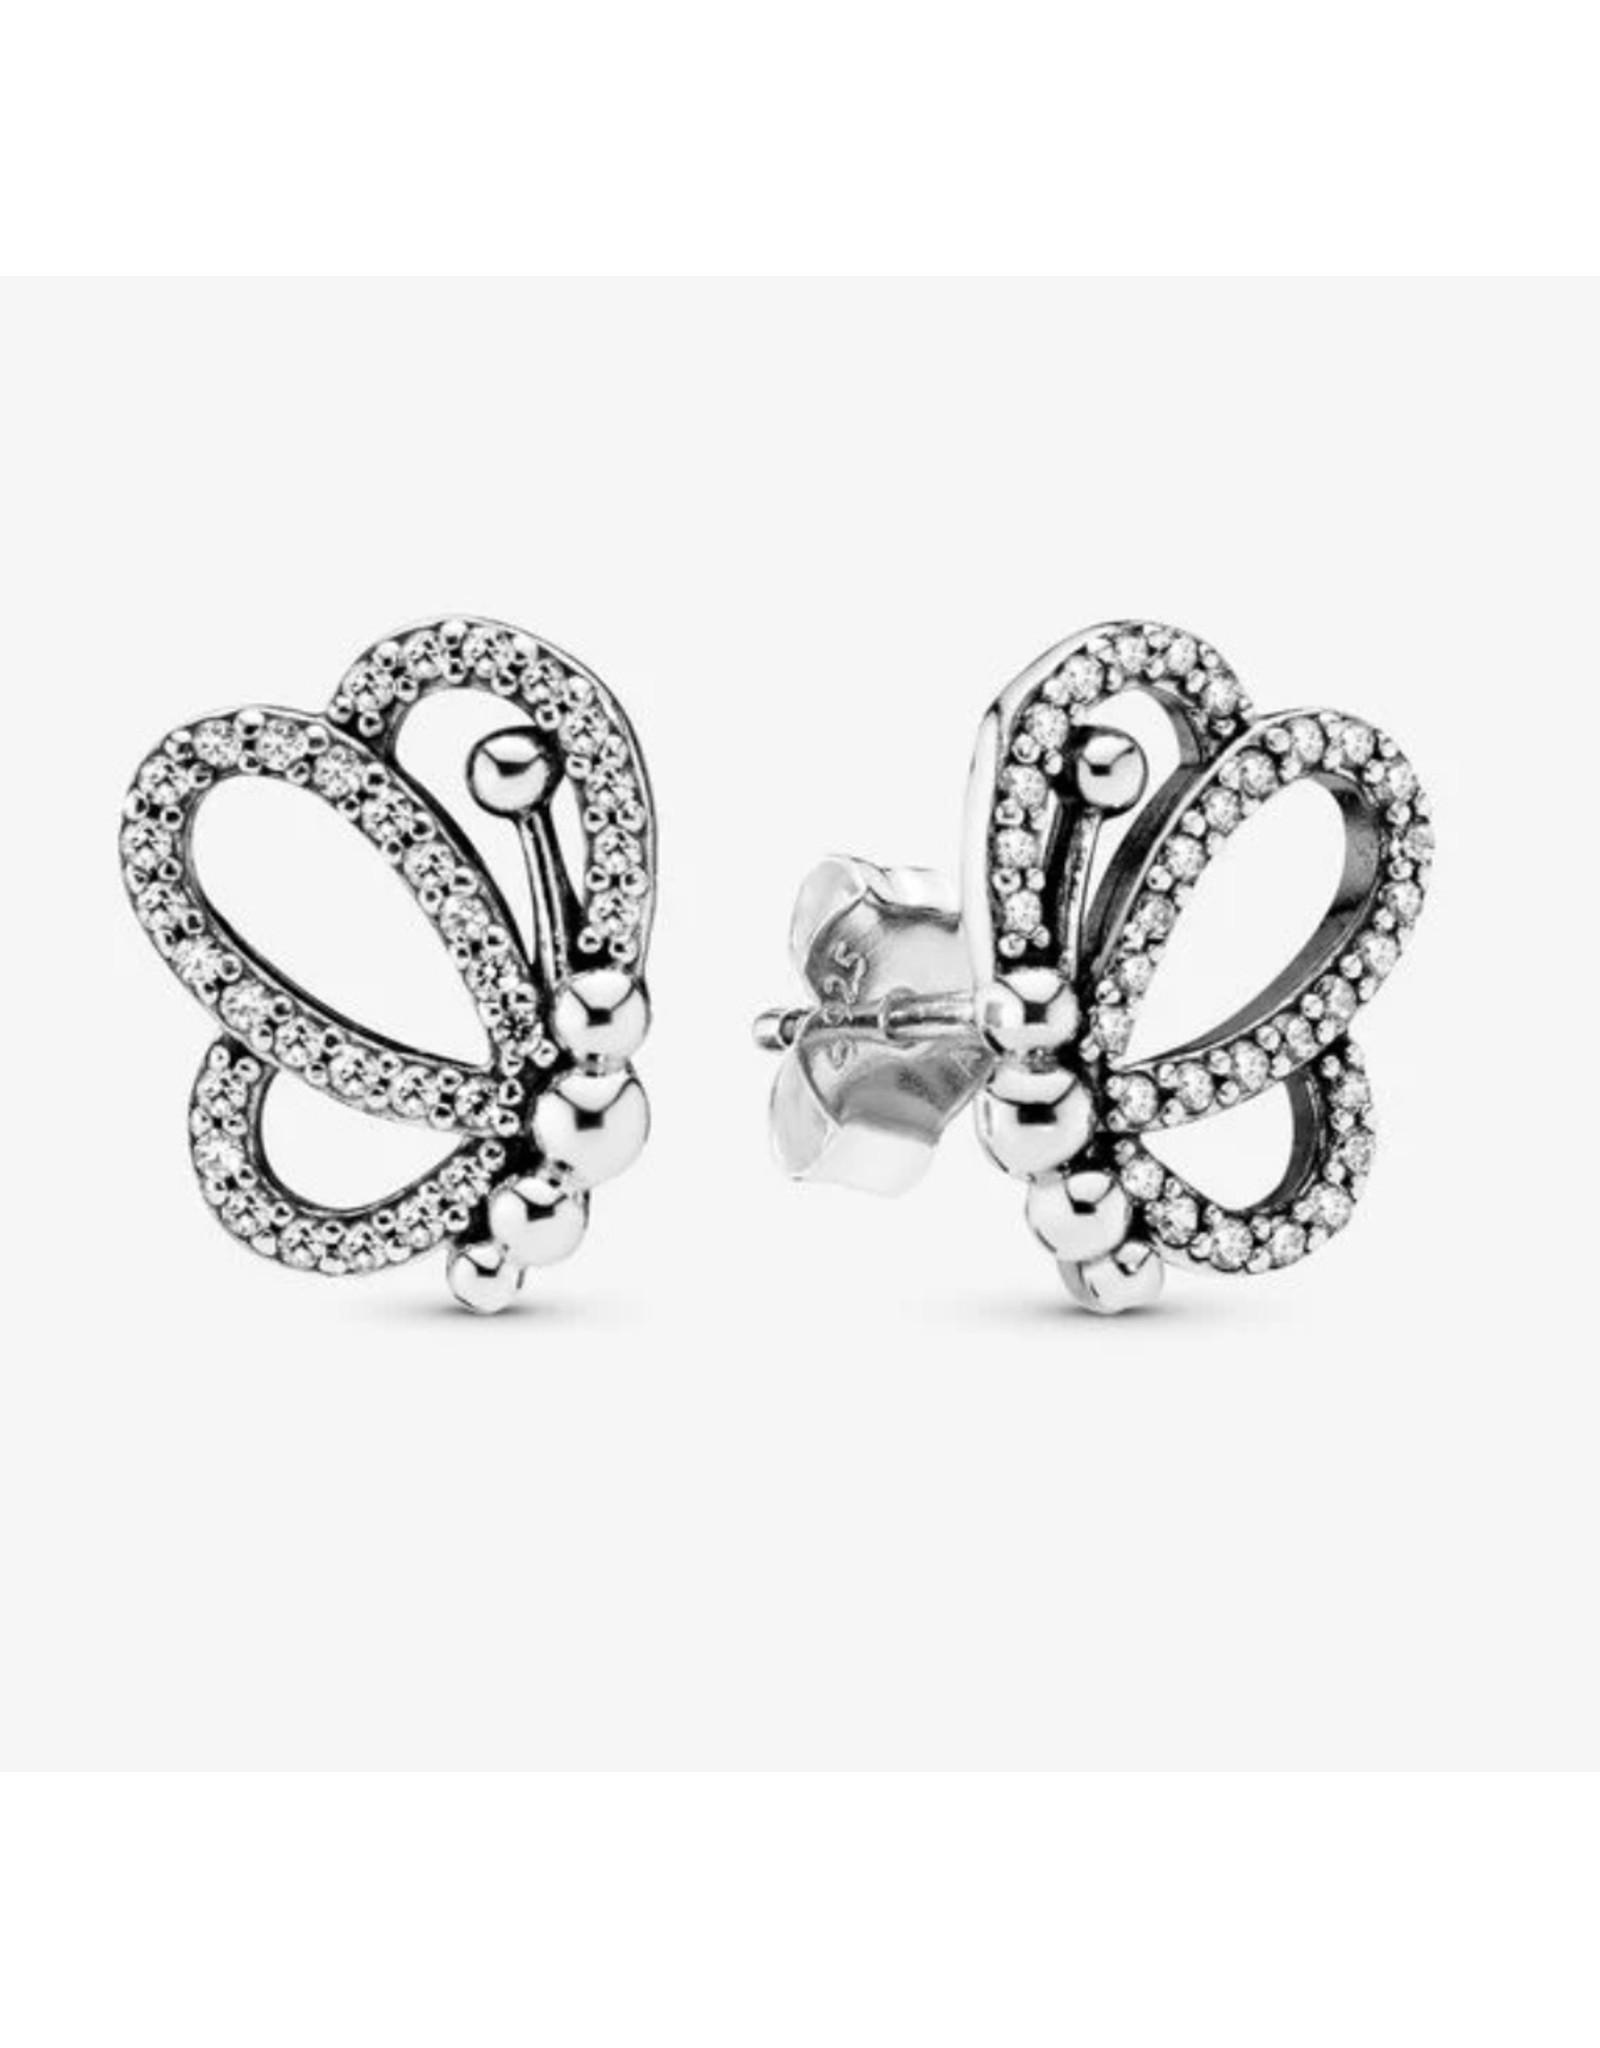 Pandora Pandora Earrings,297912CZ,Openwork Butterfly Stud